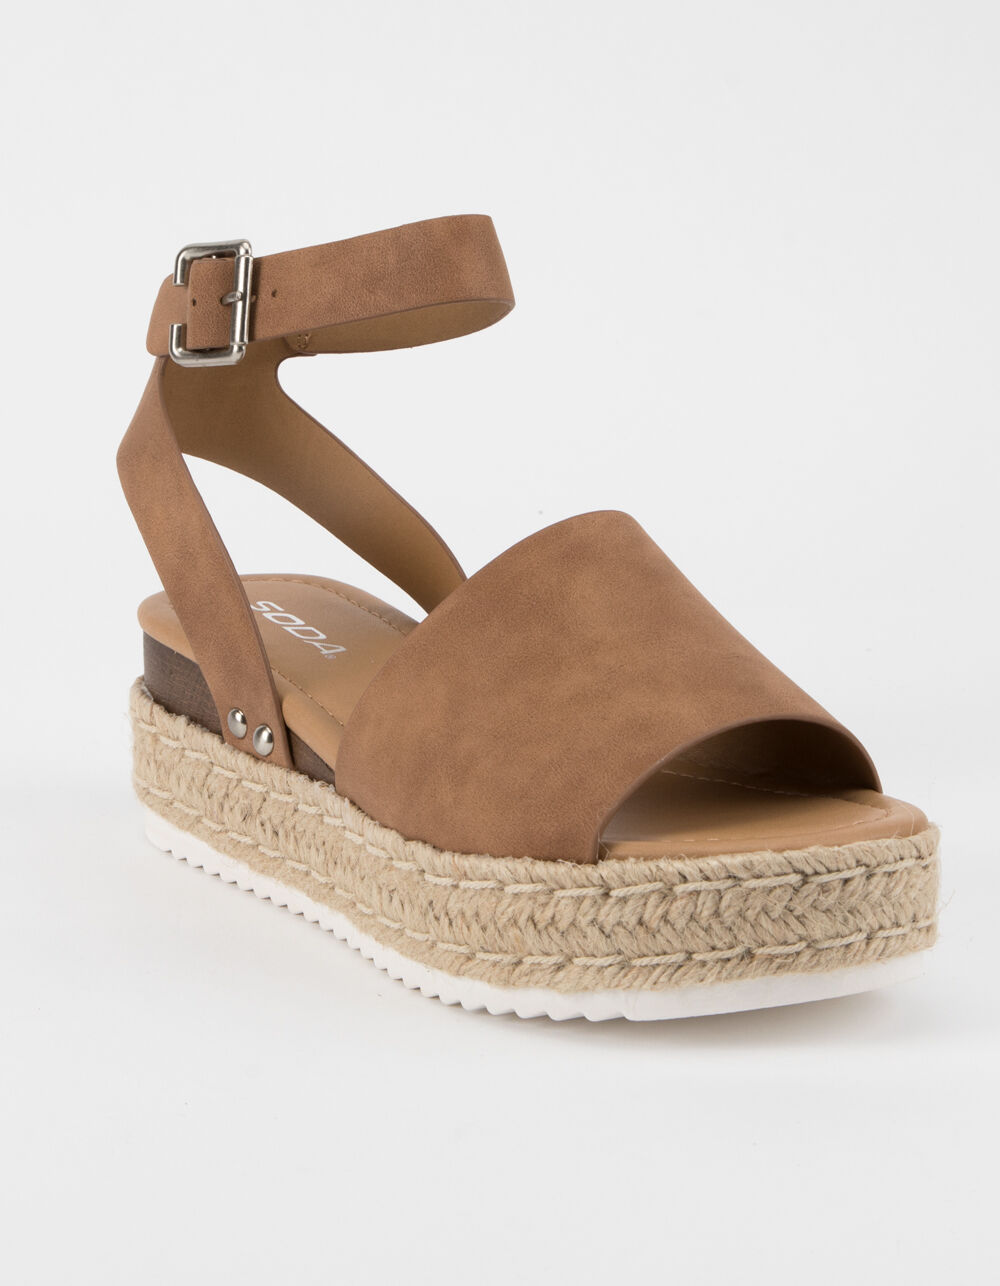 SODA Topic Tan Espadrille Flatform Sandals